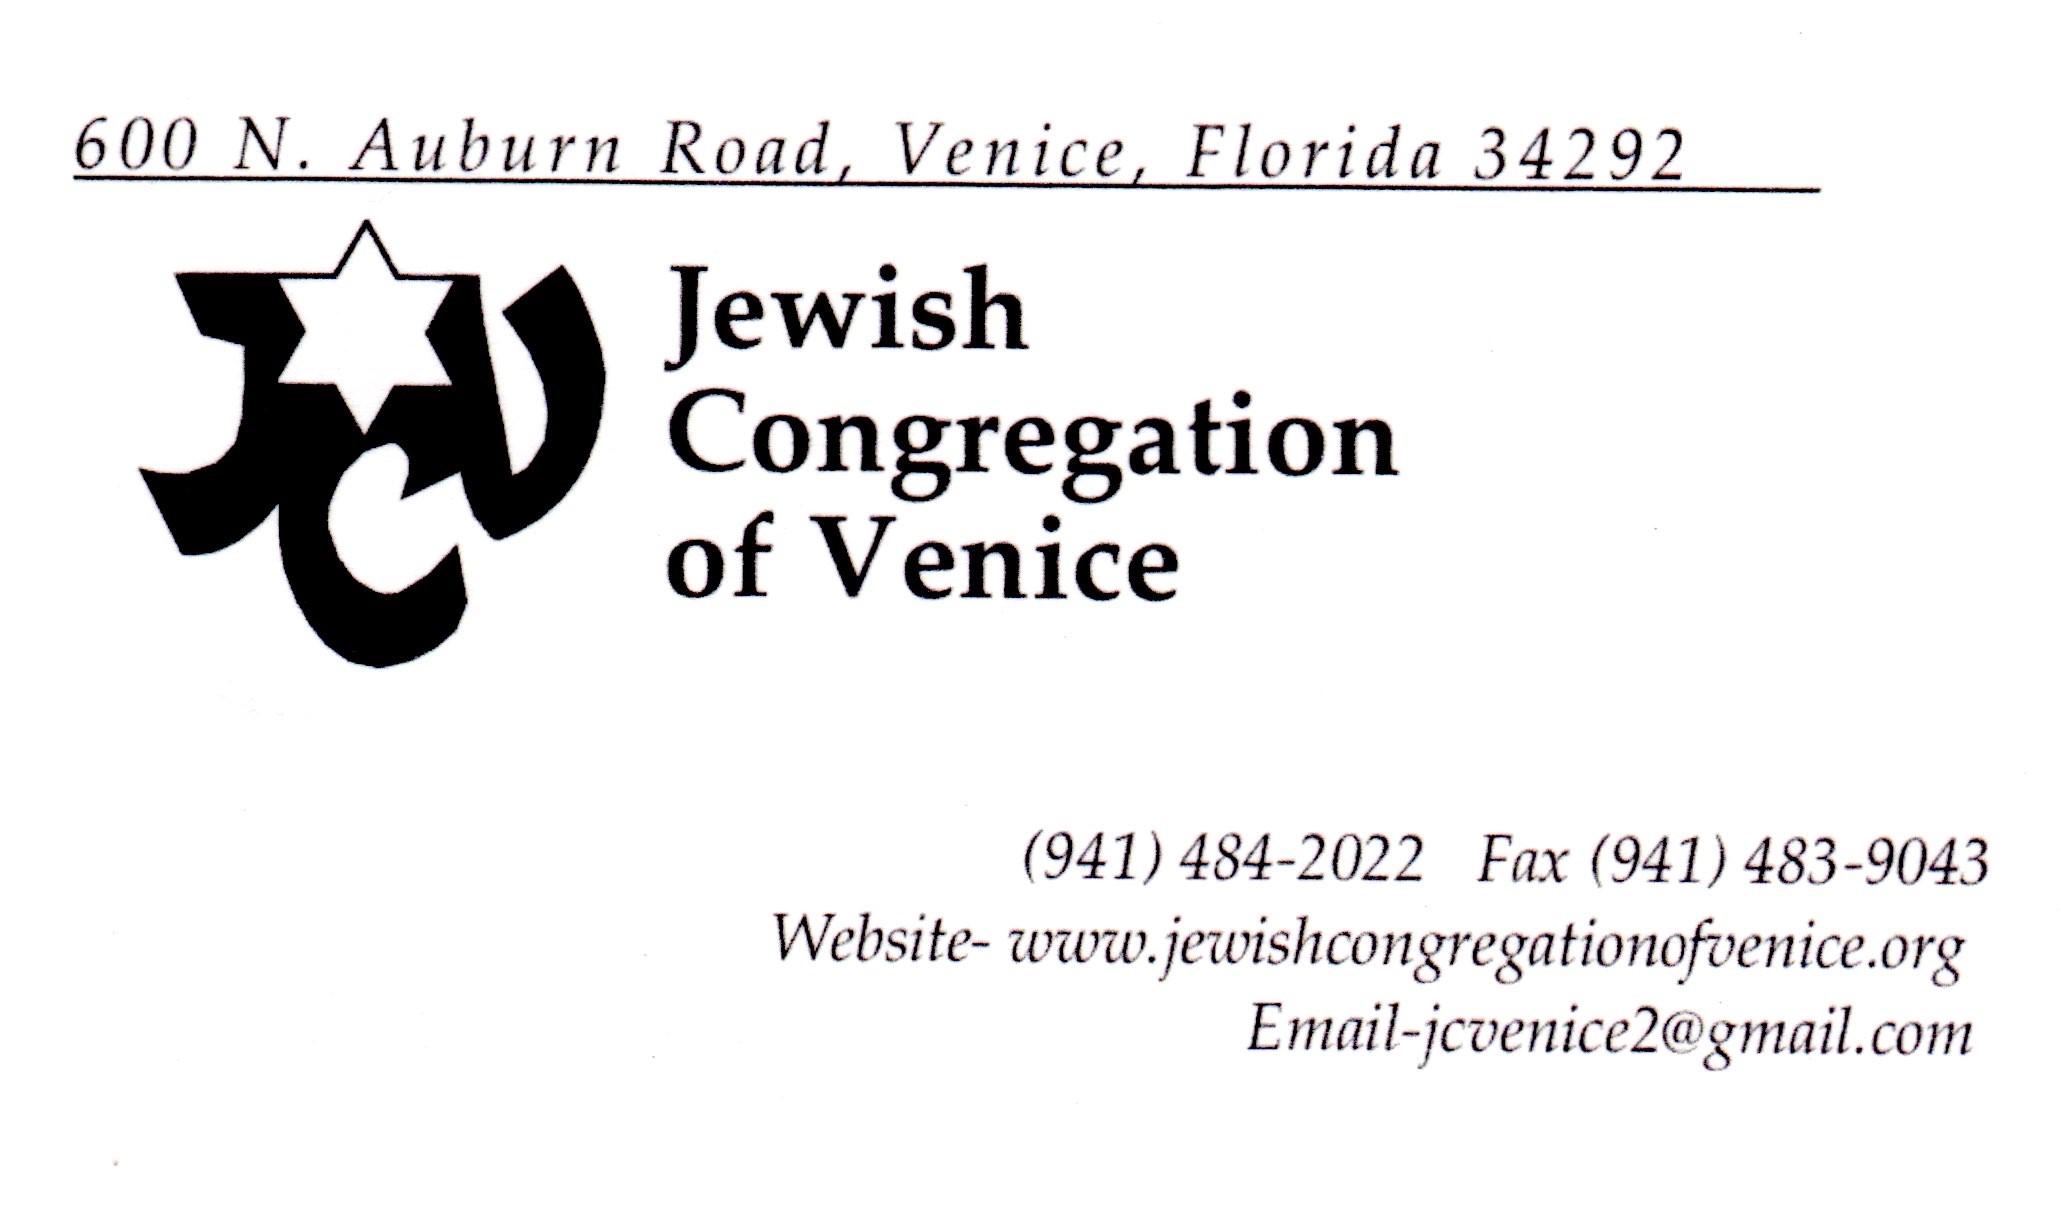 Jewish Congregation of Venice